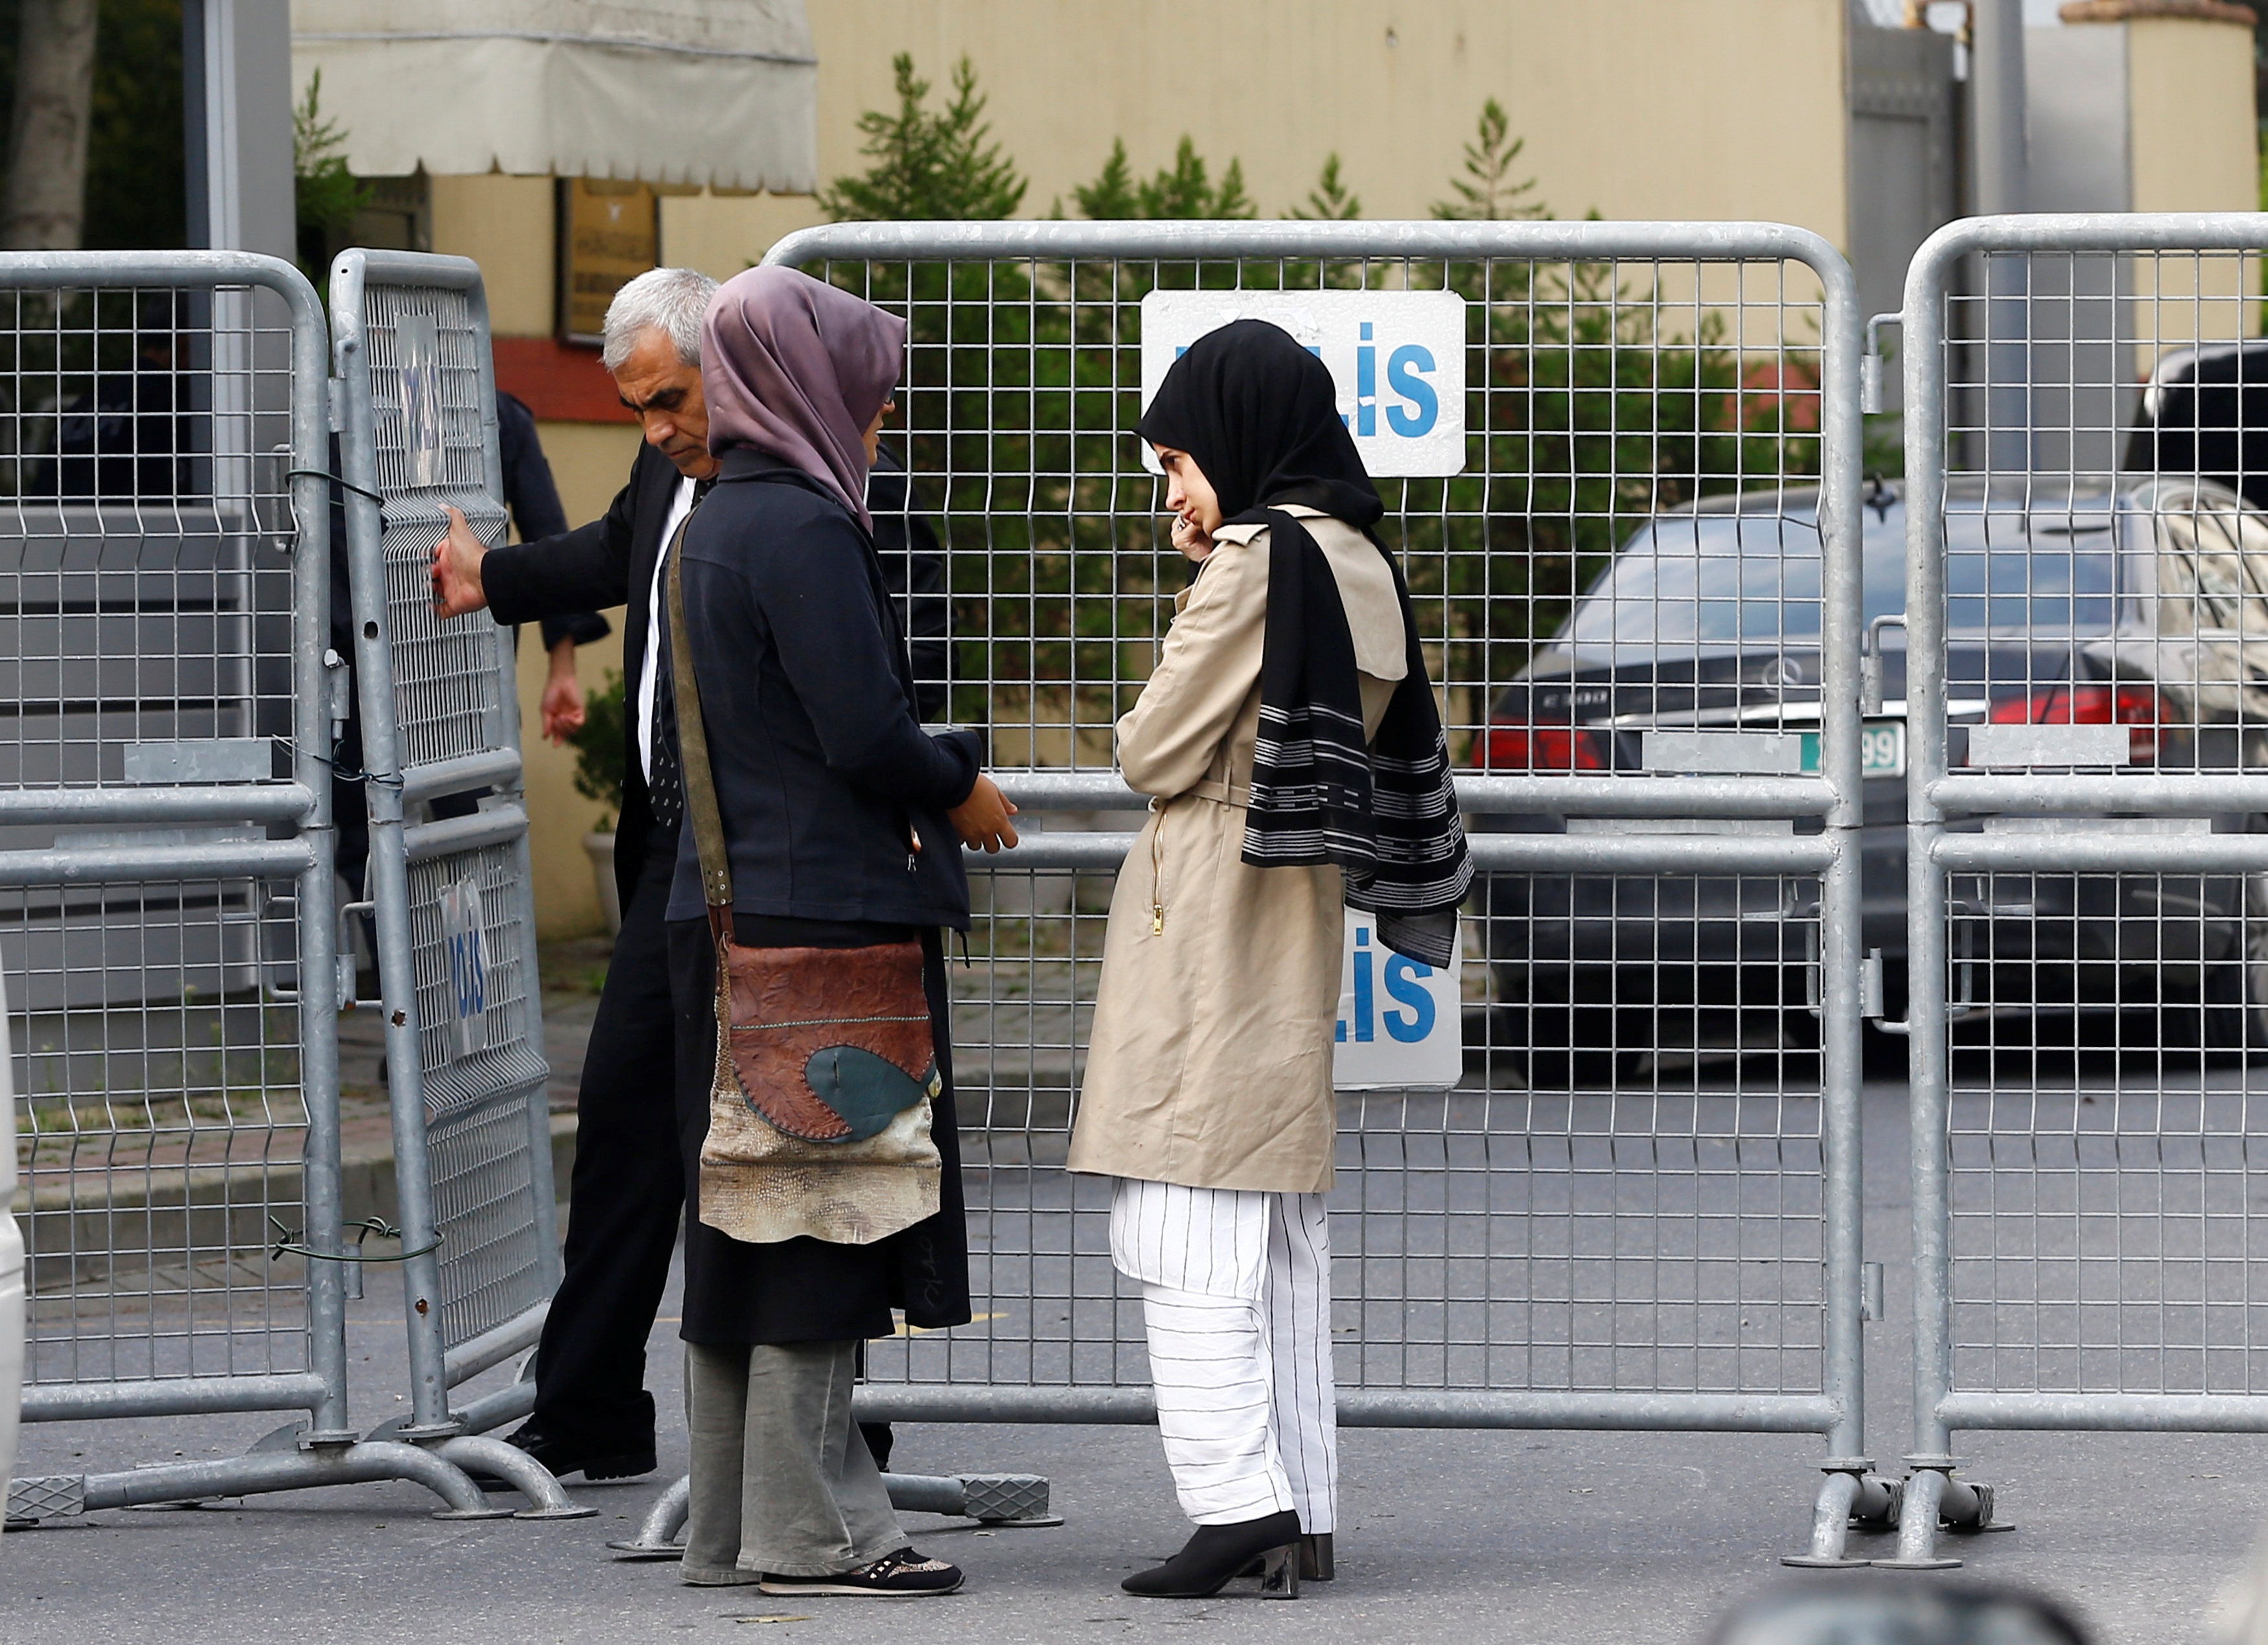 Fiancee of Saudi journalist Jamal Khashoggi and her friend wait outside Saudi Arabia's consulate in Istanbul